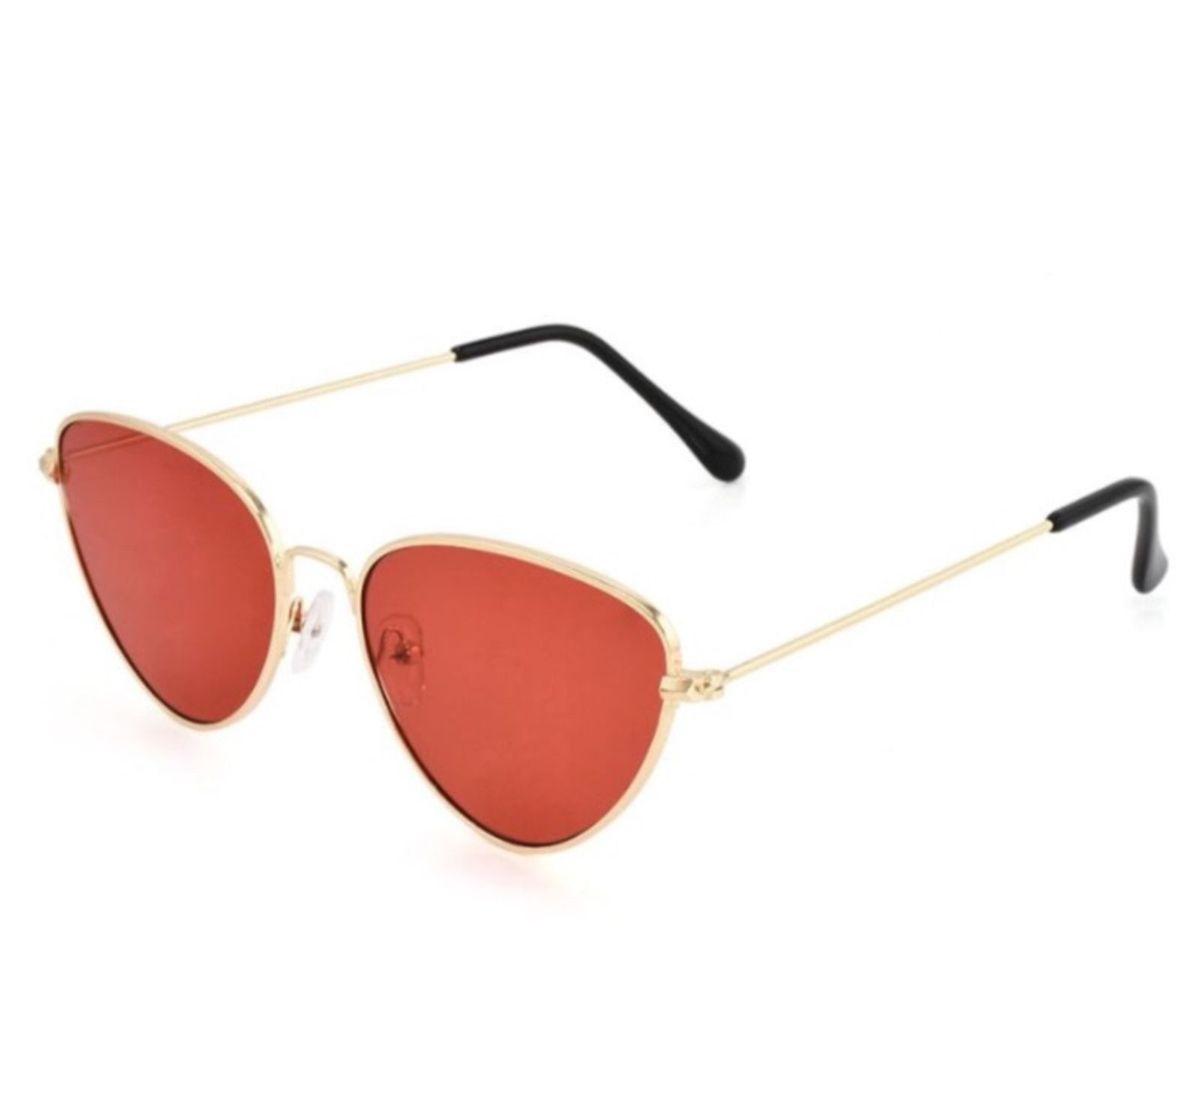 óculos gatinho lente vermelha - óculos sem marca.  Czm6ly9wag90b3muzw5qb2vplmnvbs5ici9wcm9kdwn0cy8xnti2mdmvytg1mgrmyjg5otjmztg1ymzmzdc1owrhnzc1n2nmzdquanbn  ... db74309f39